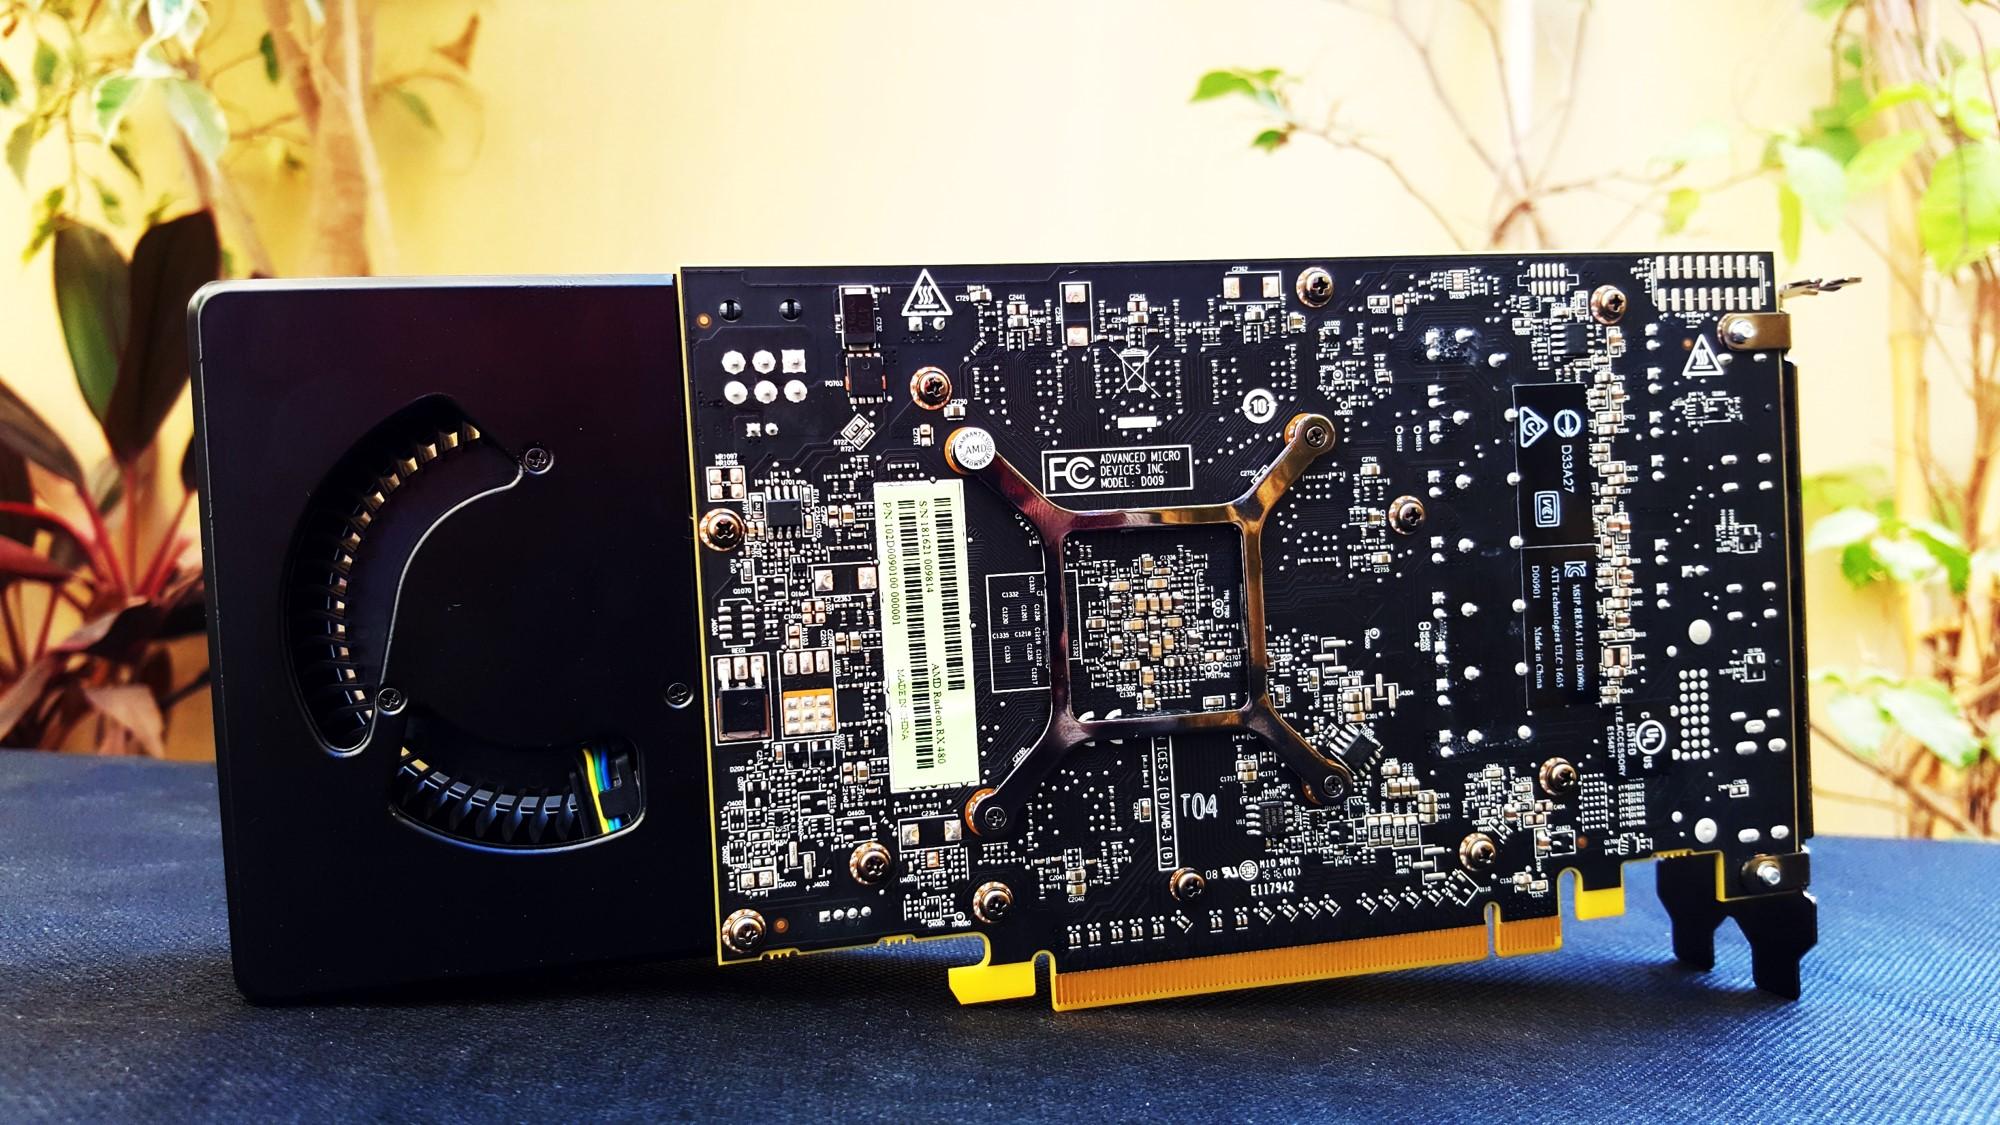 8-AMD Radeon RX 480